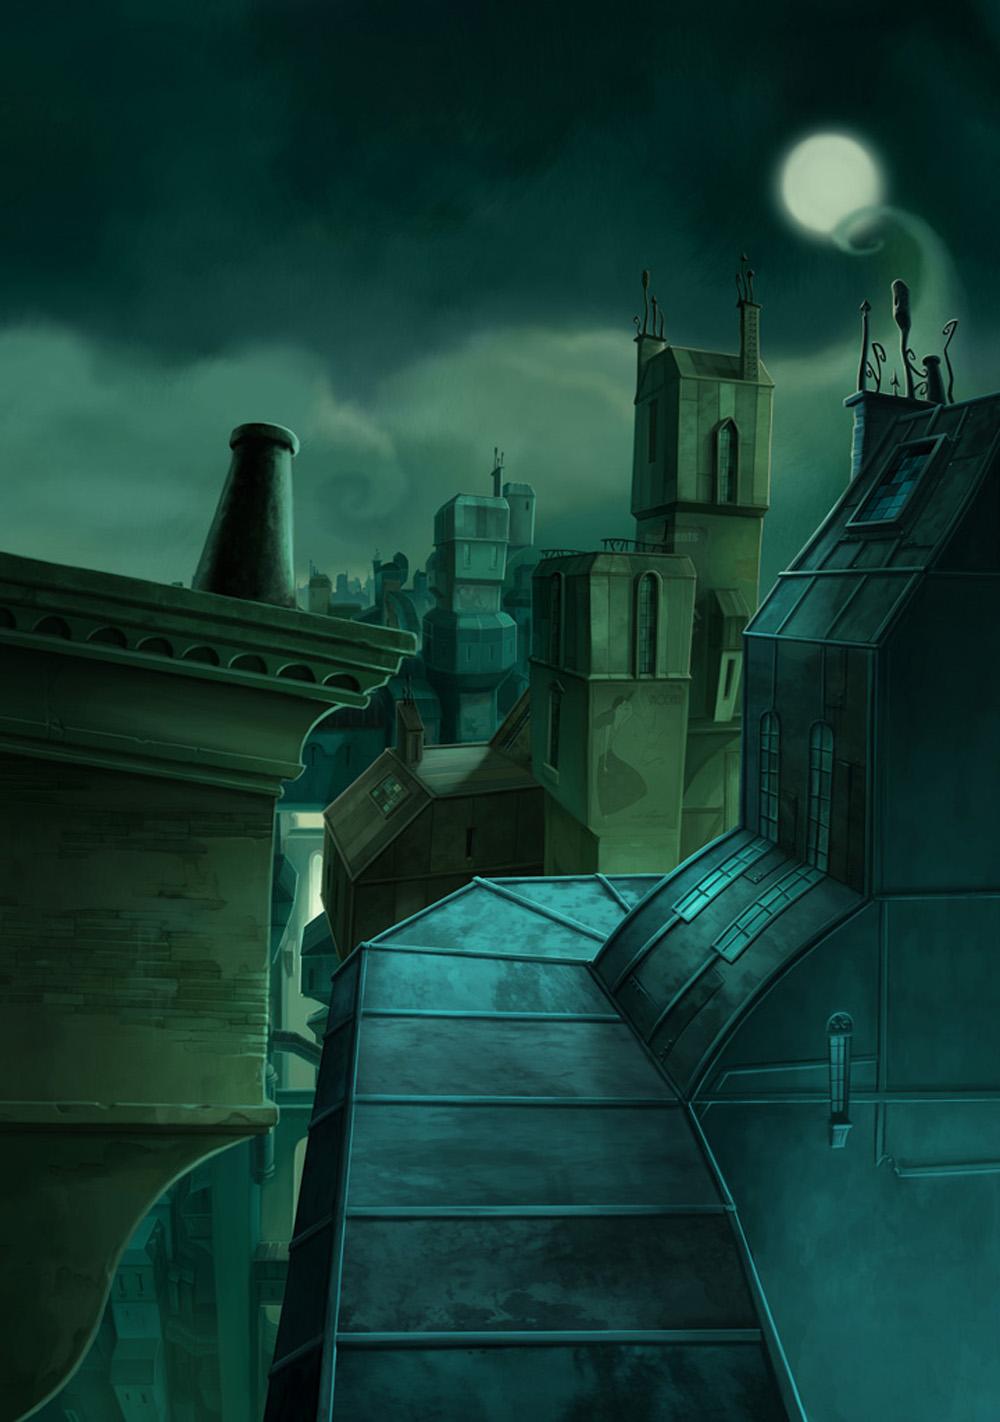 nocturna-2007-concept-art-backgrounds_14.jpg